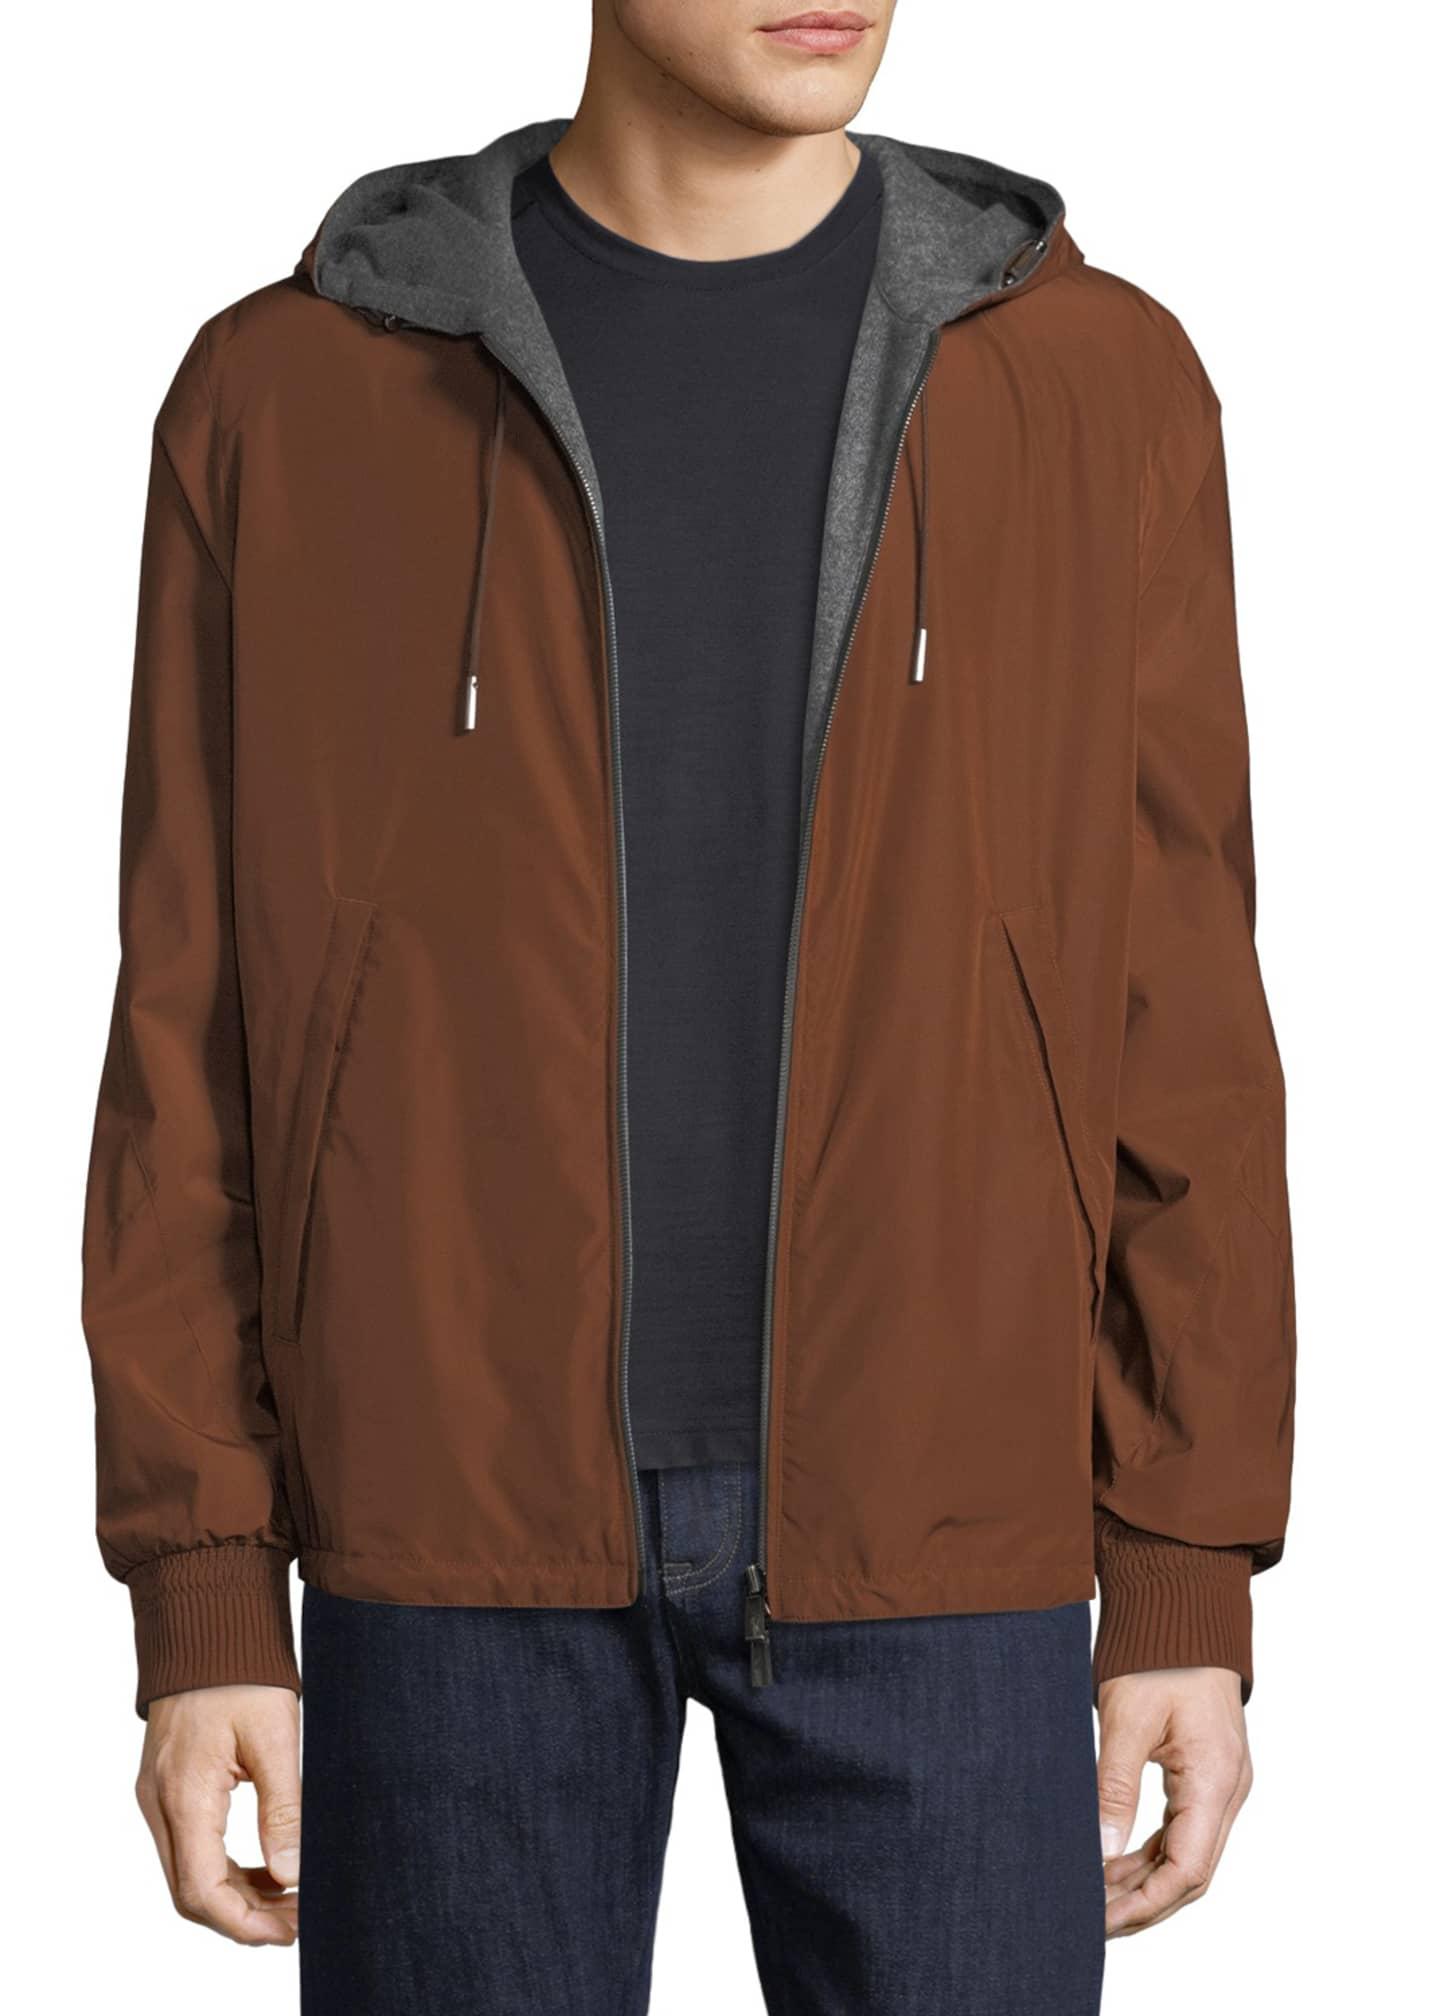 Ermenegildo Zegna Men's Reversible Blouson Jacket with Hoodie